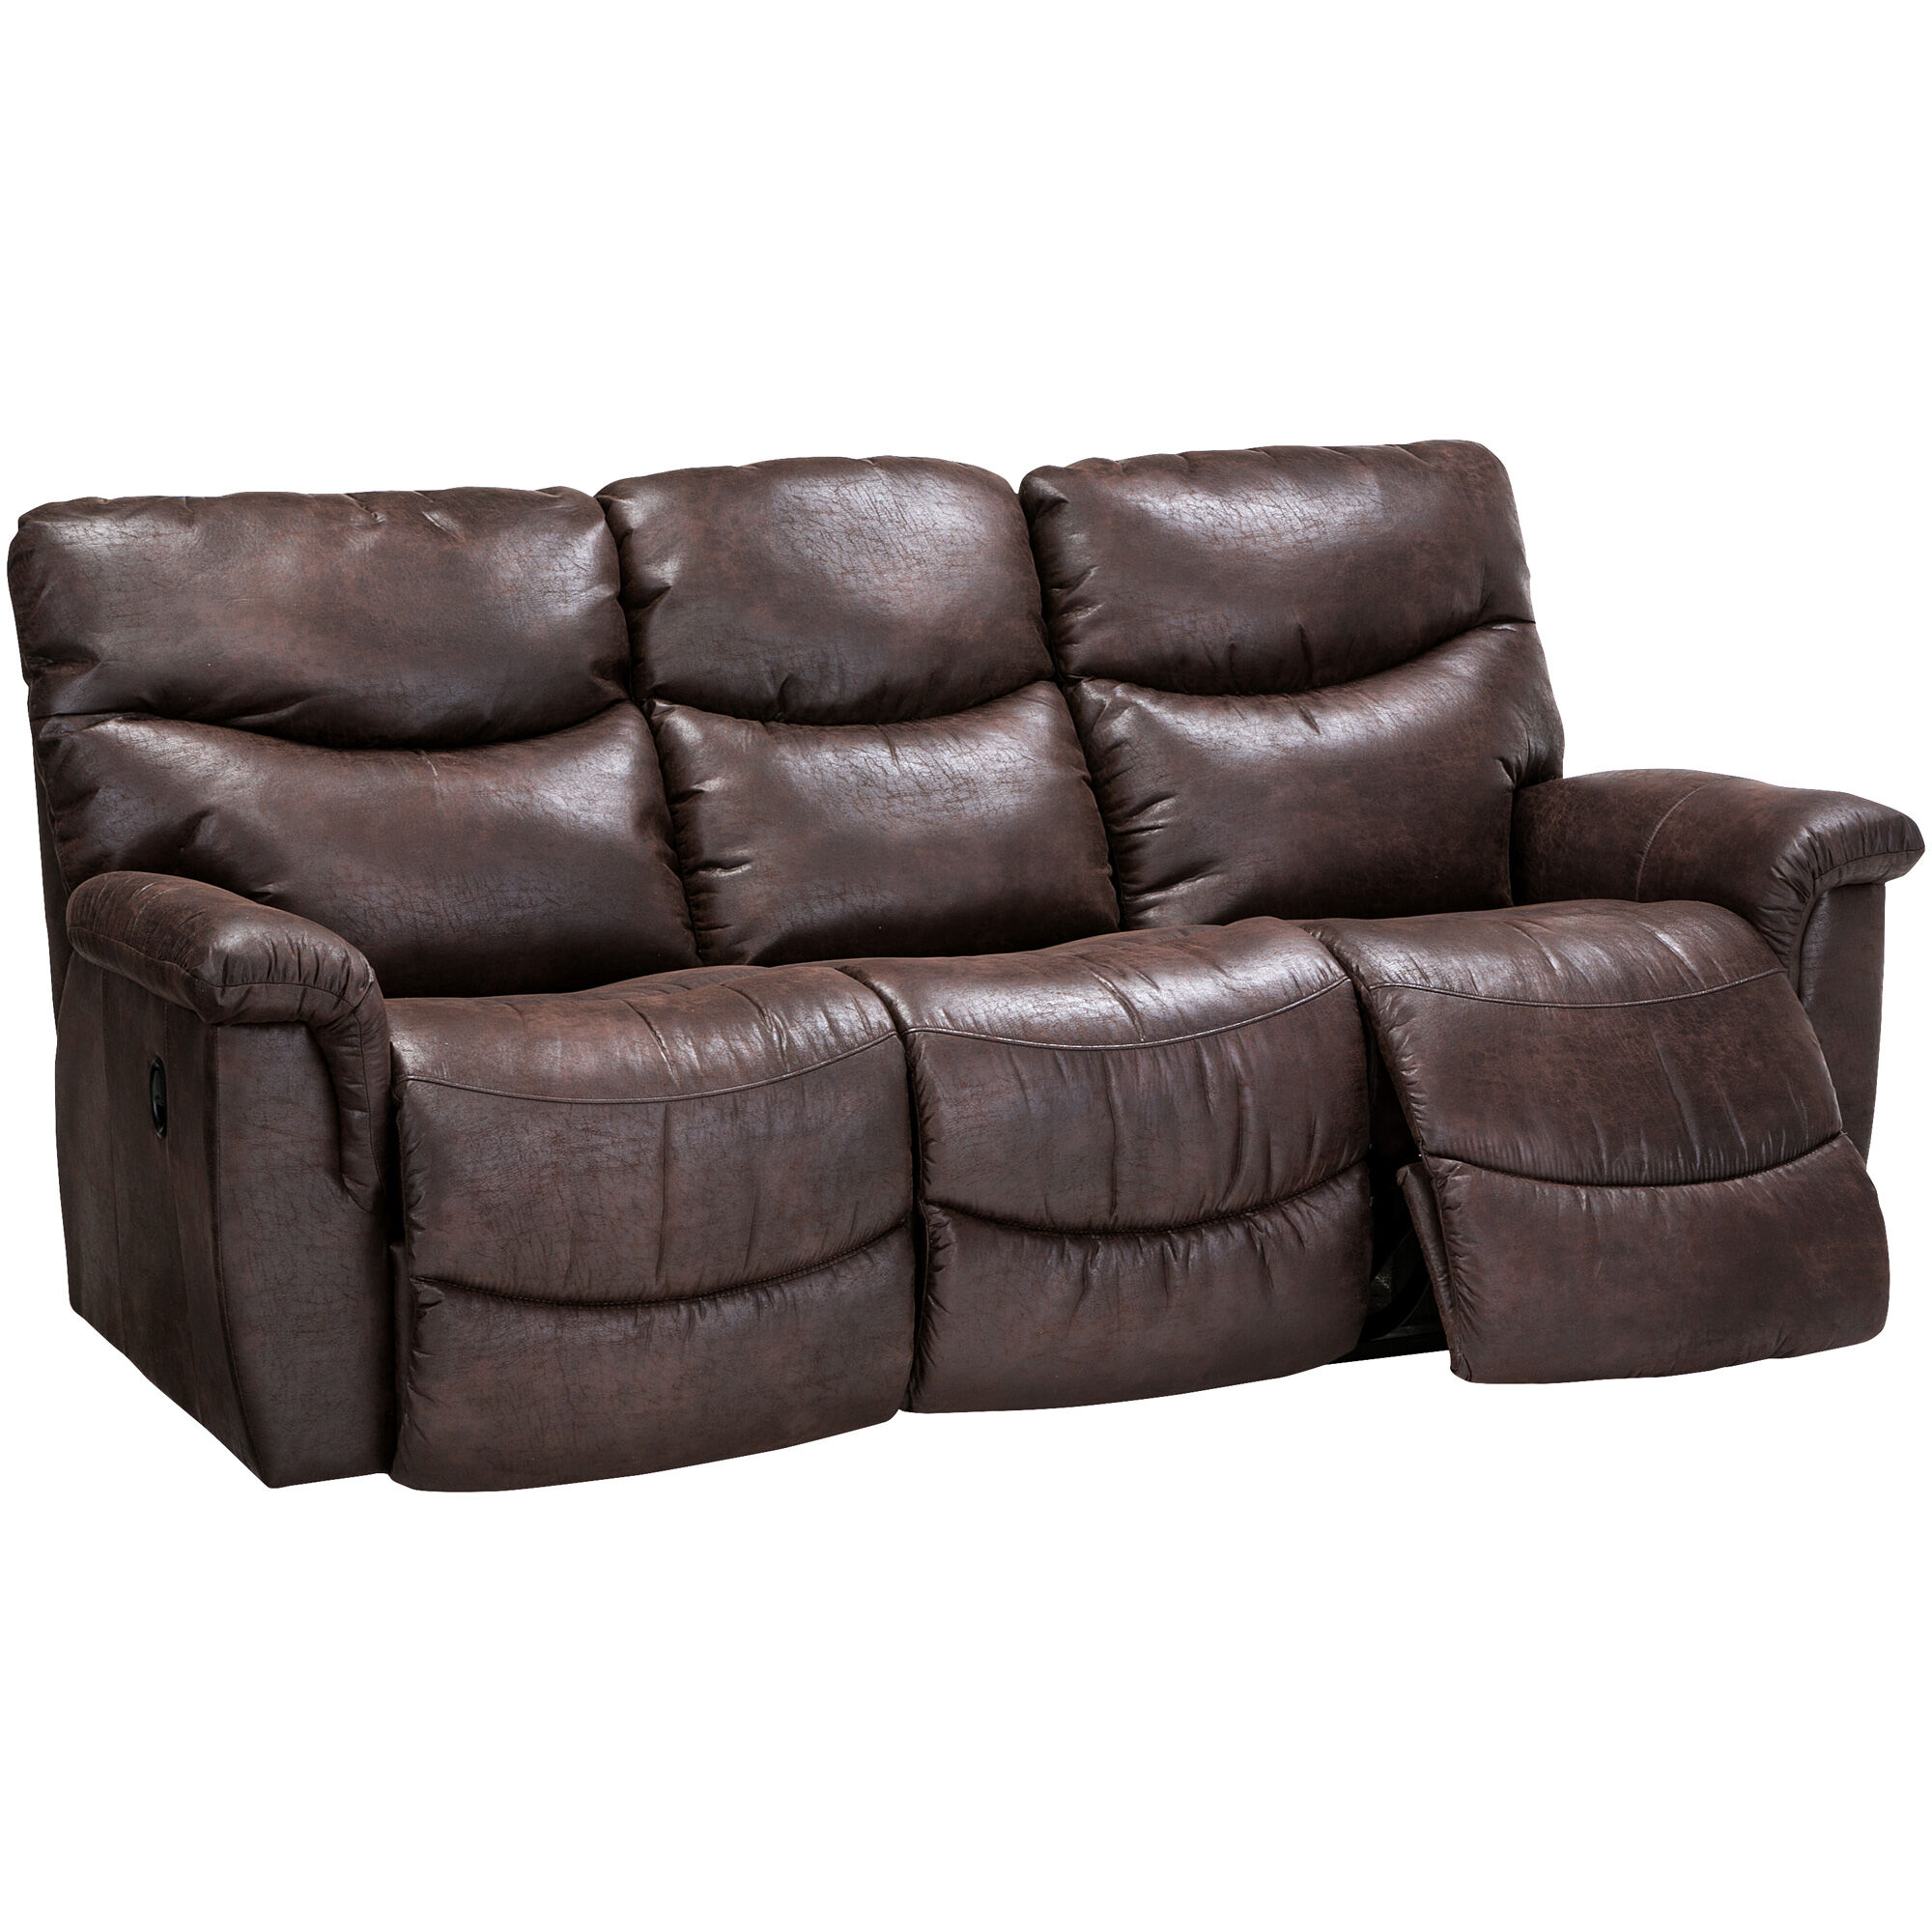 slumberland sofa recliners stickley mission style leather furniture | la-z-boy james sable